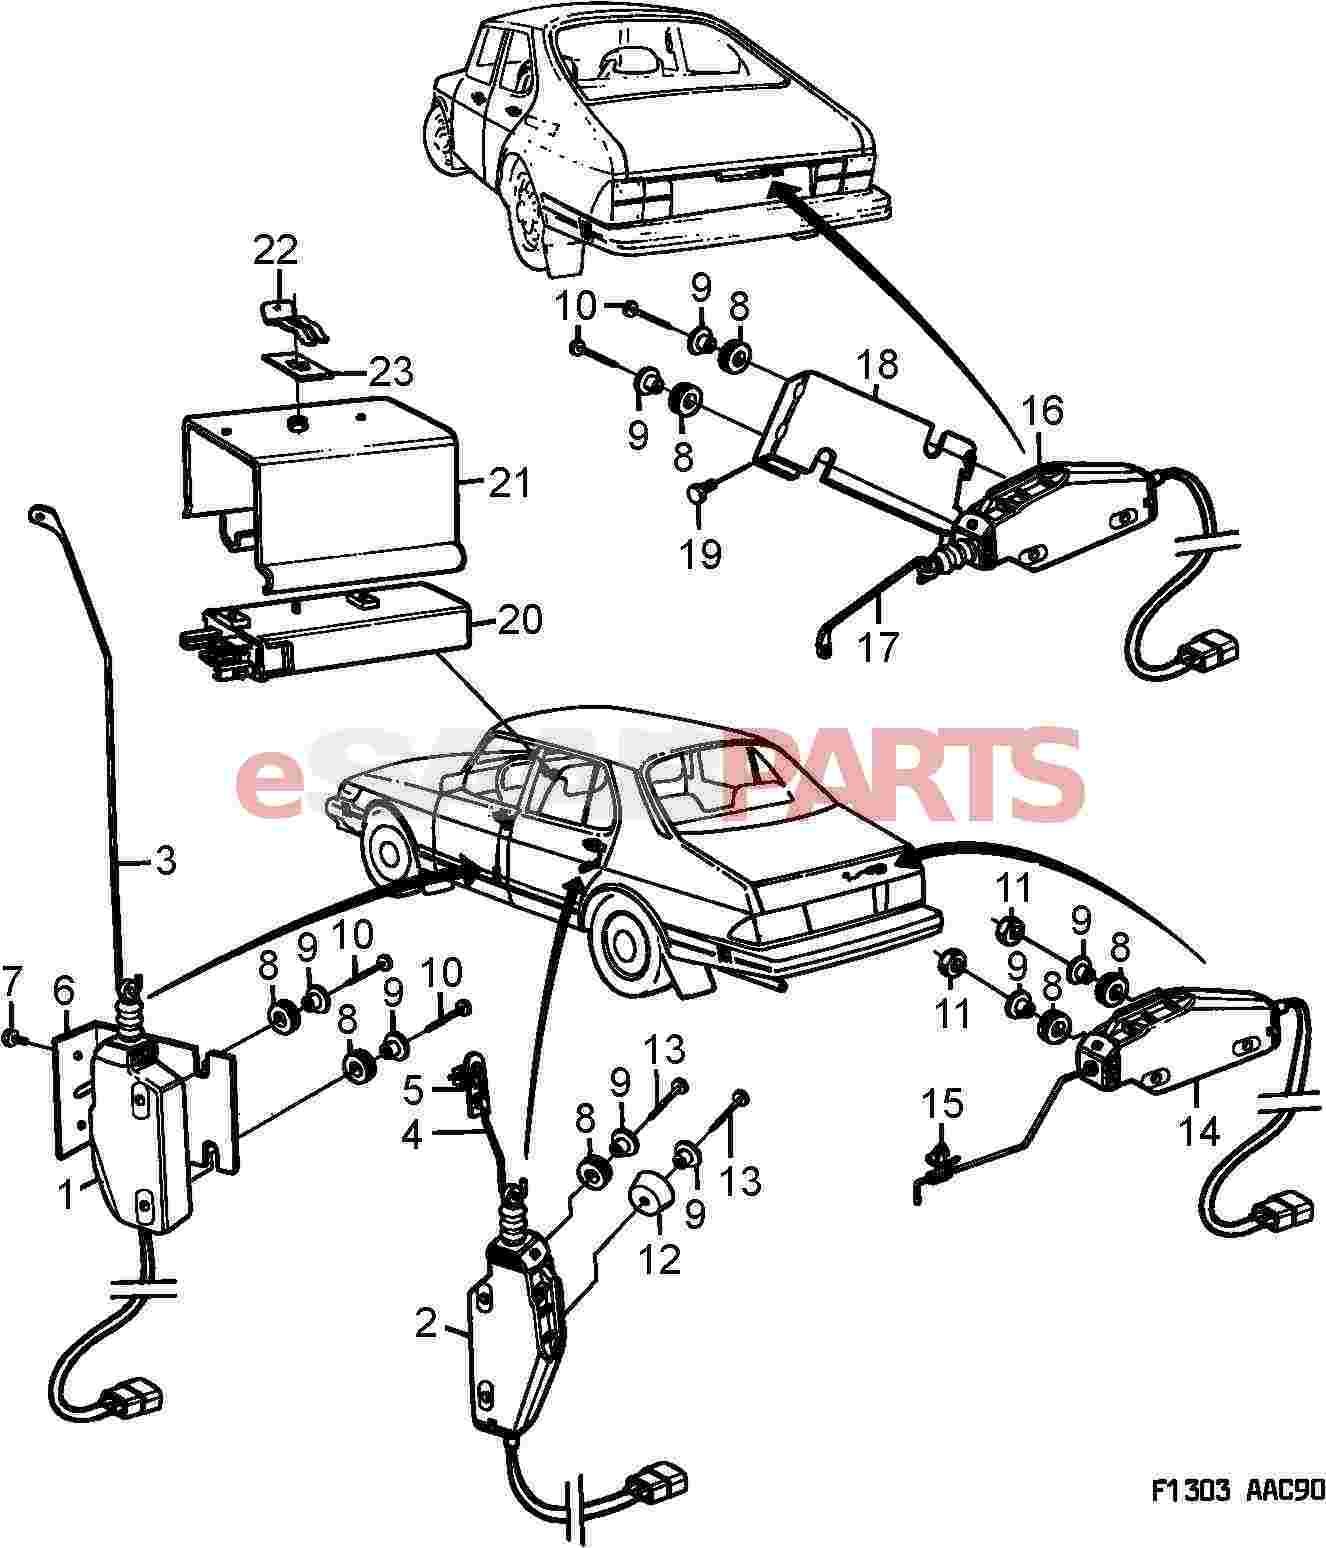 toyota mr2 roadster fuse box diagram